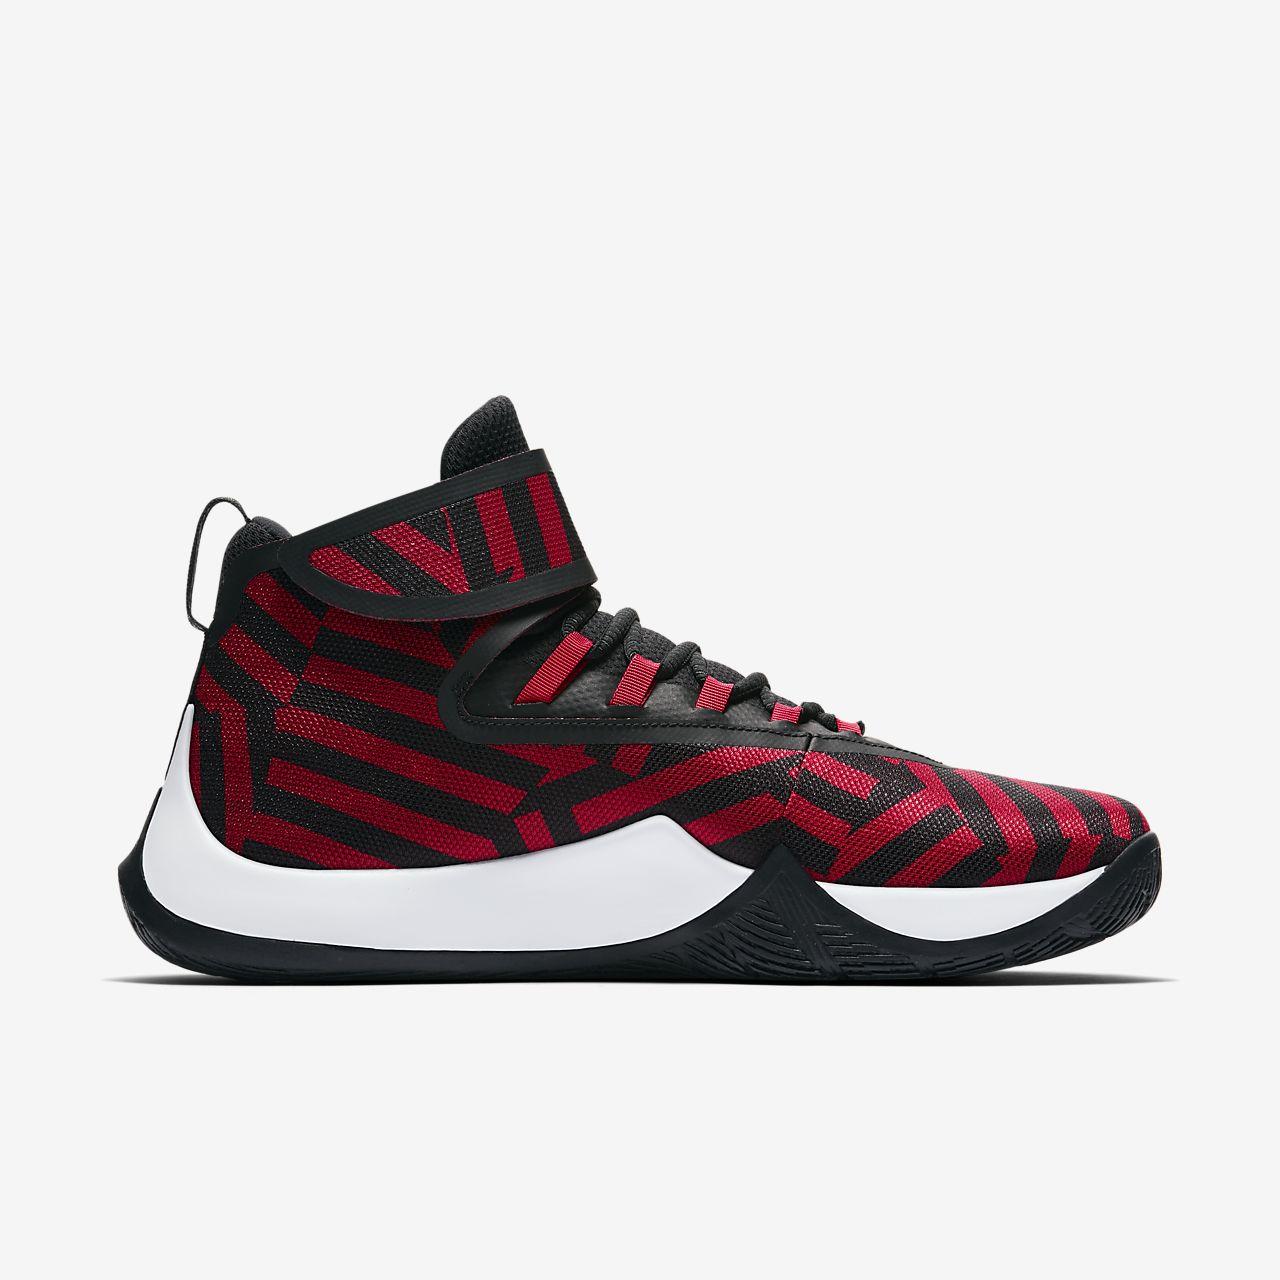 migliori scarpe da basket nike